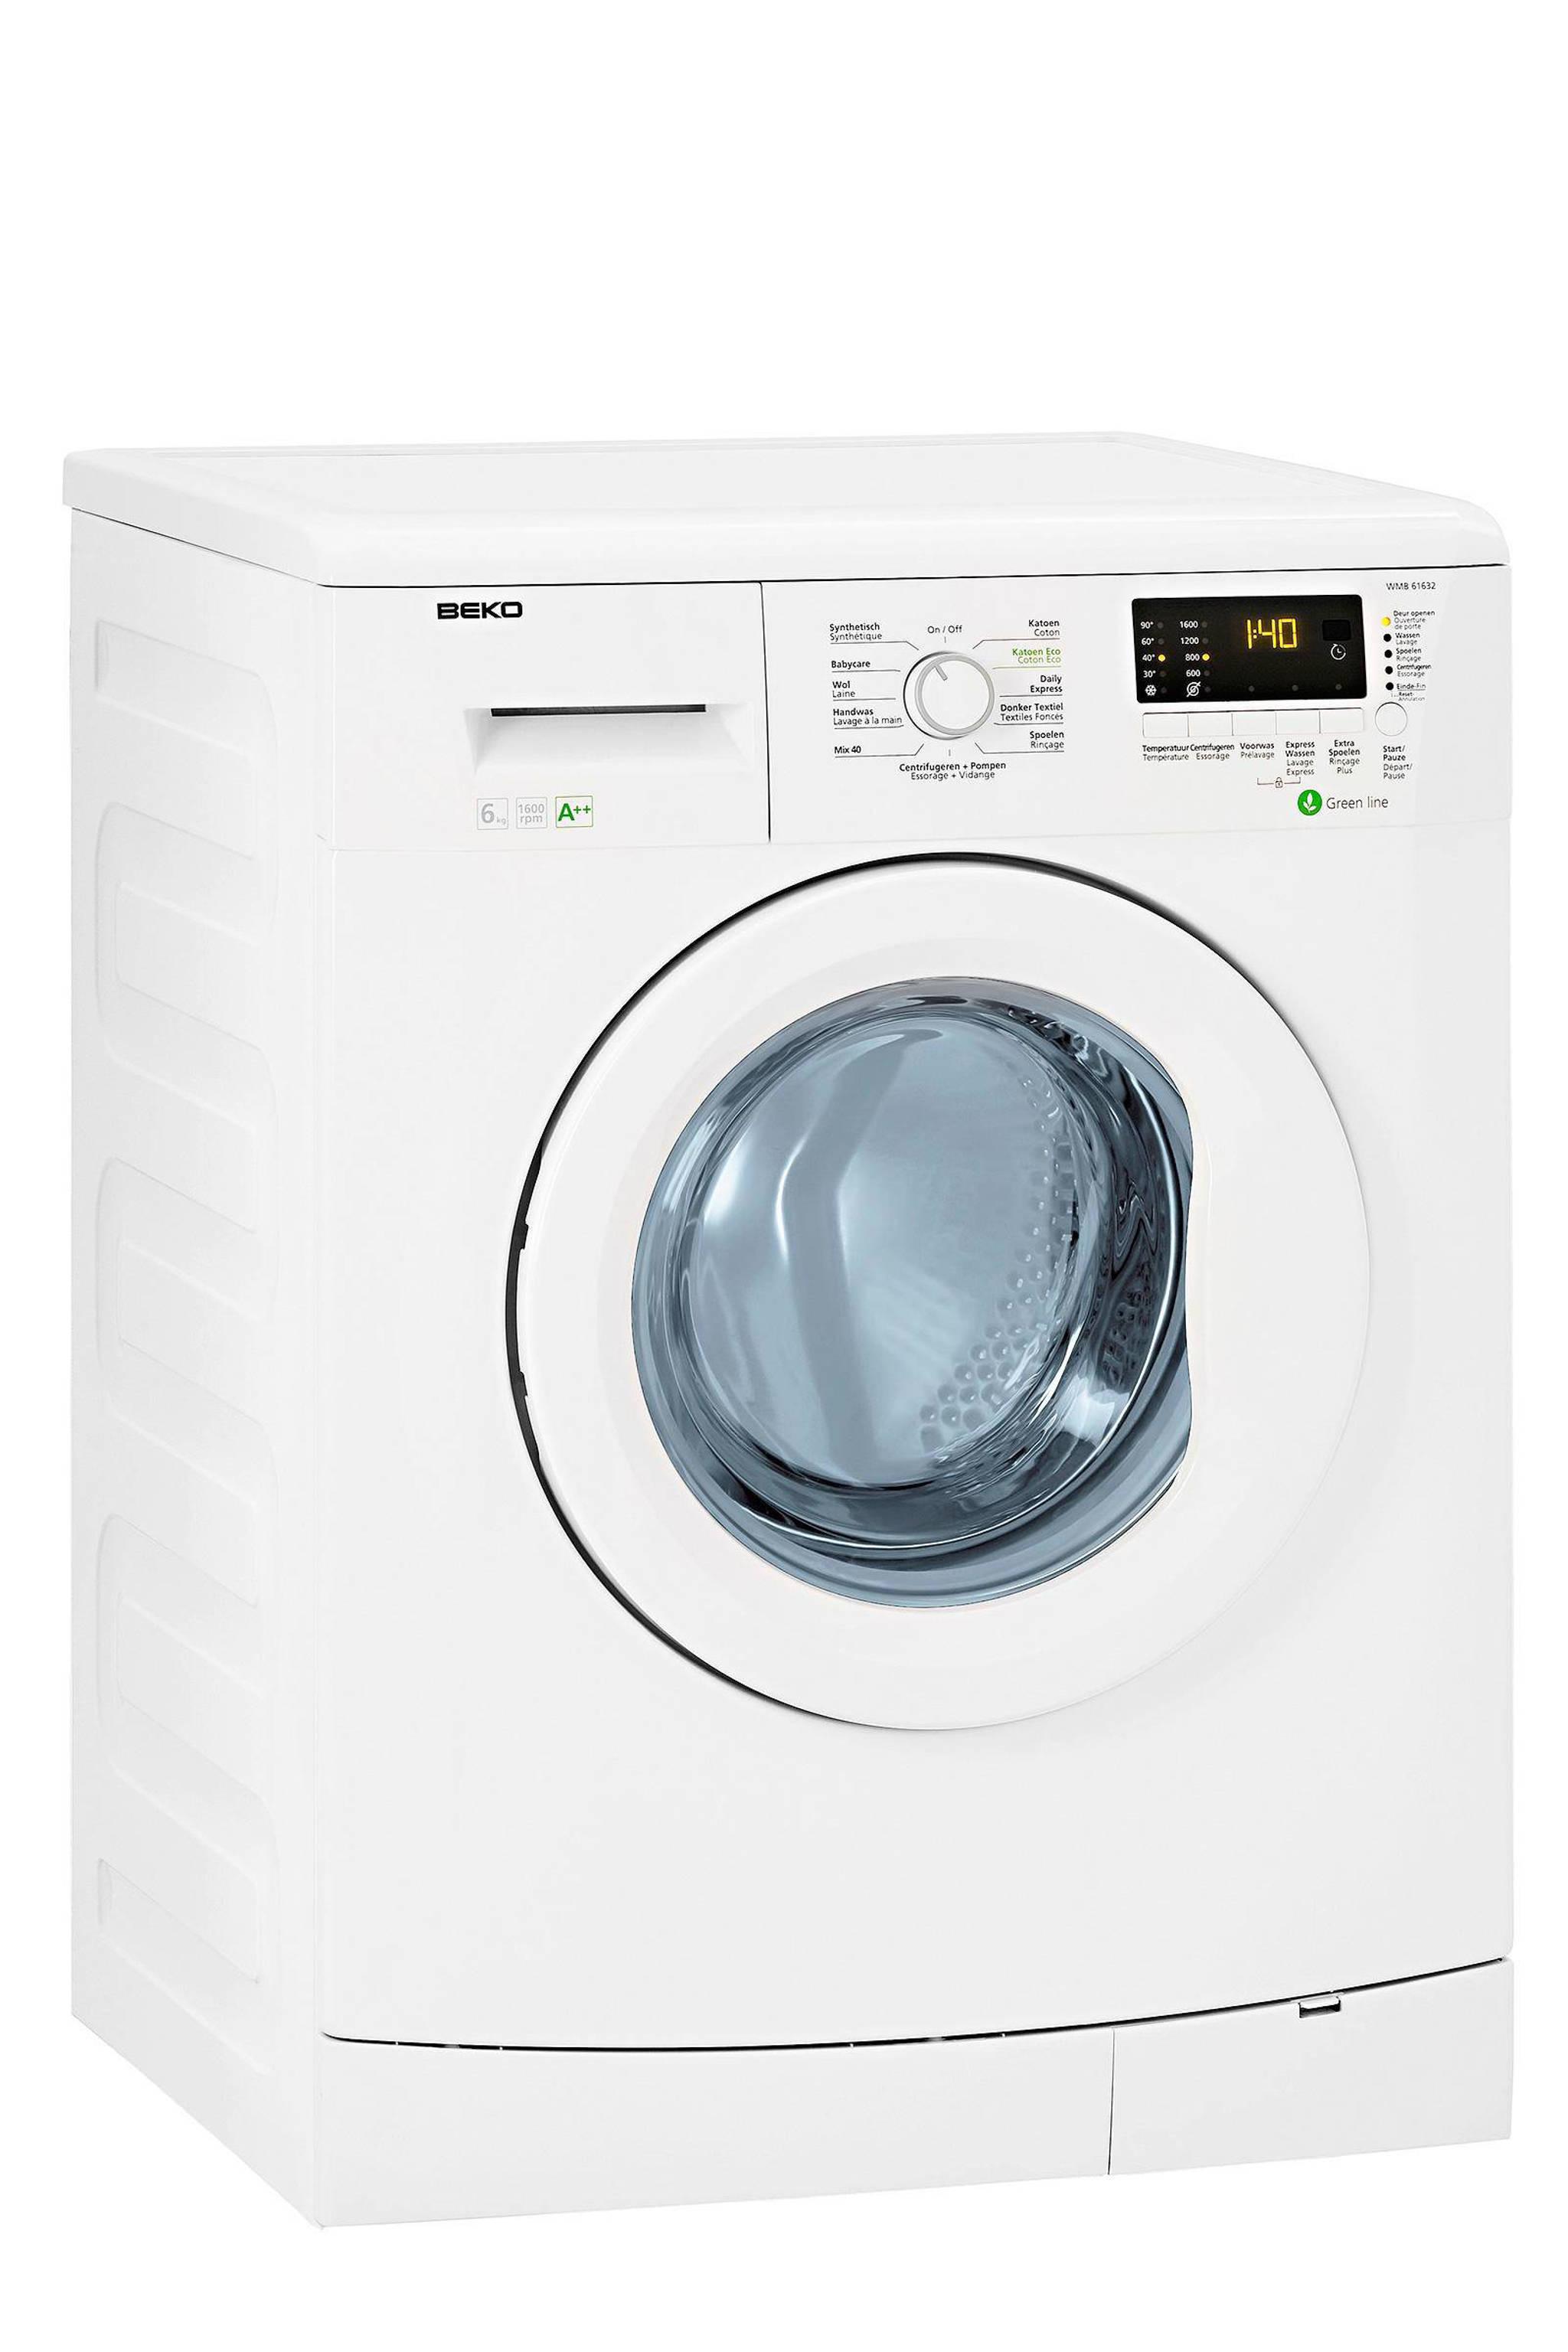 Super Beko WMB 61632 wasmachine   wehkamp II39